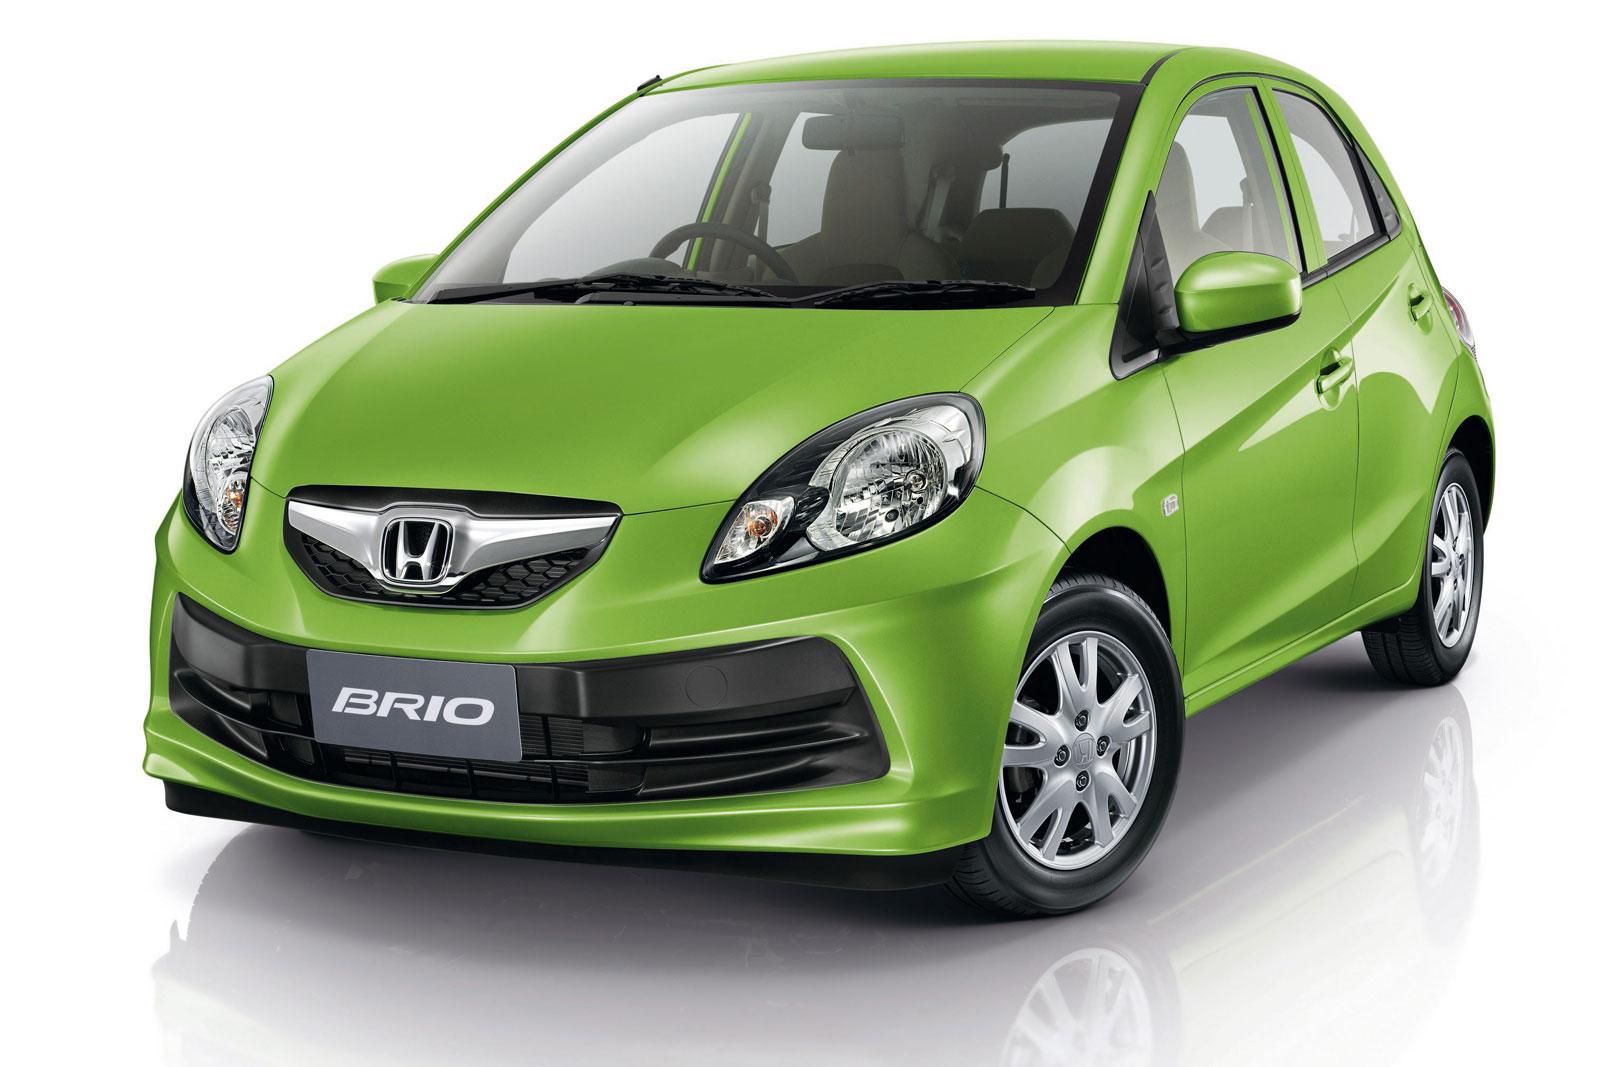 Modifikasi Honda Brio